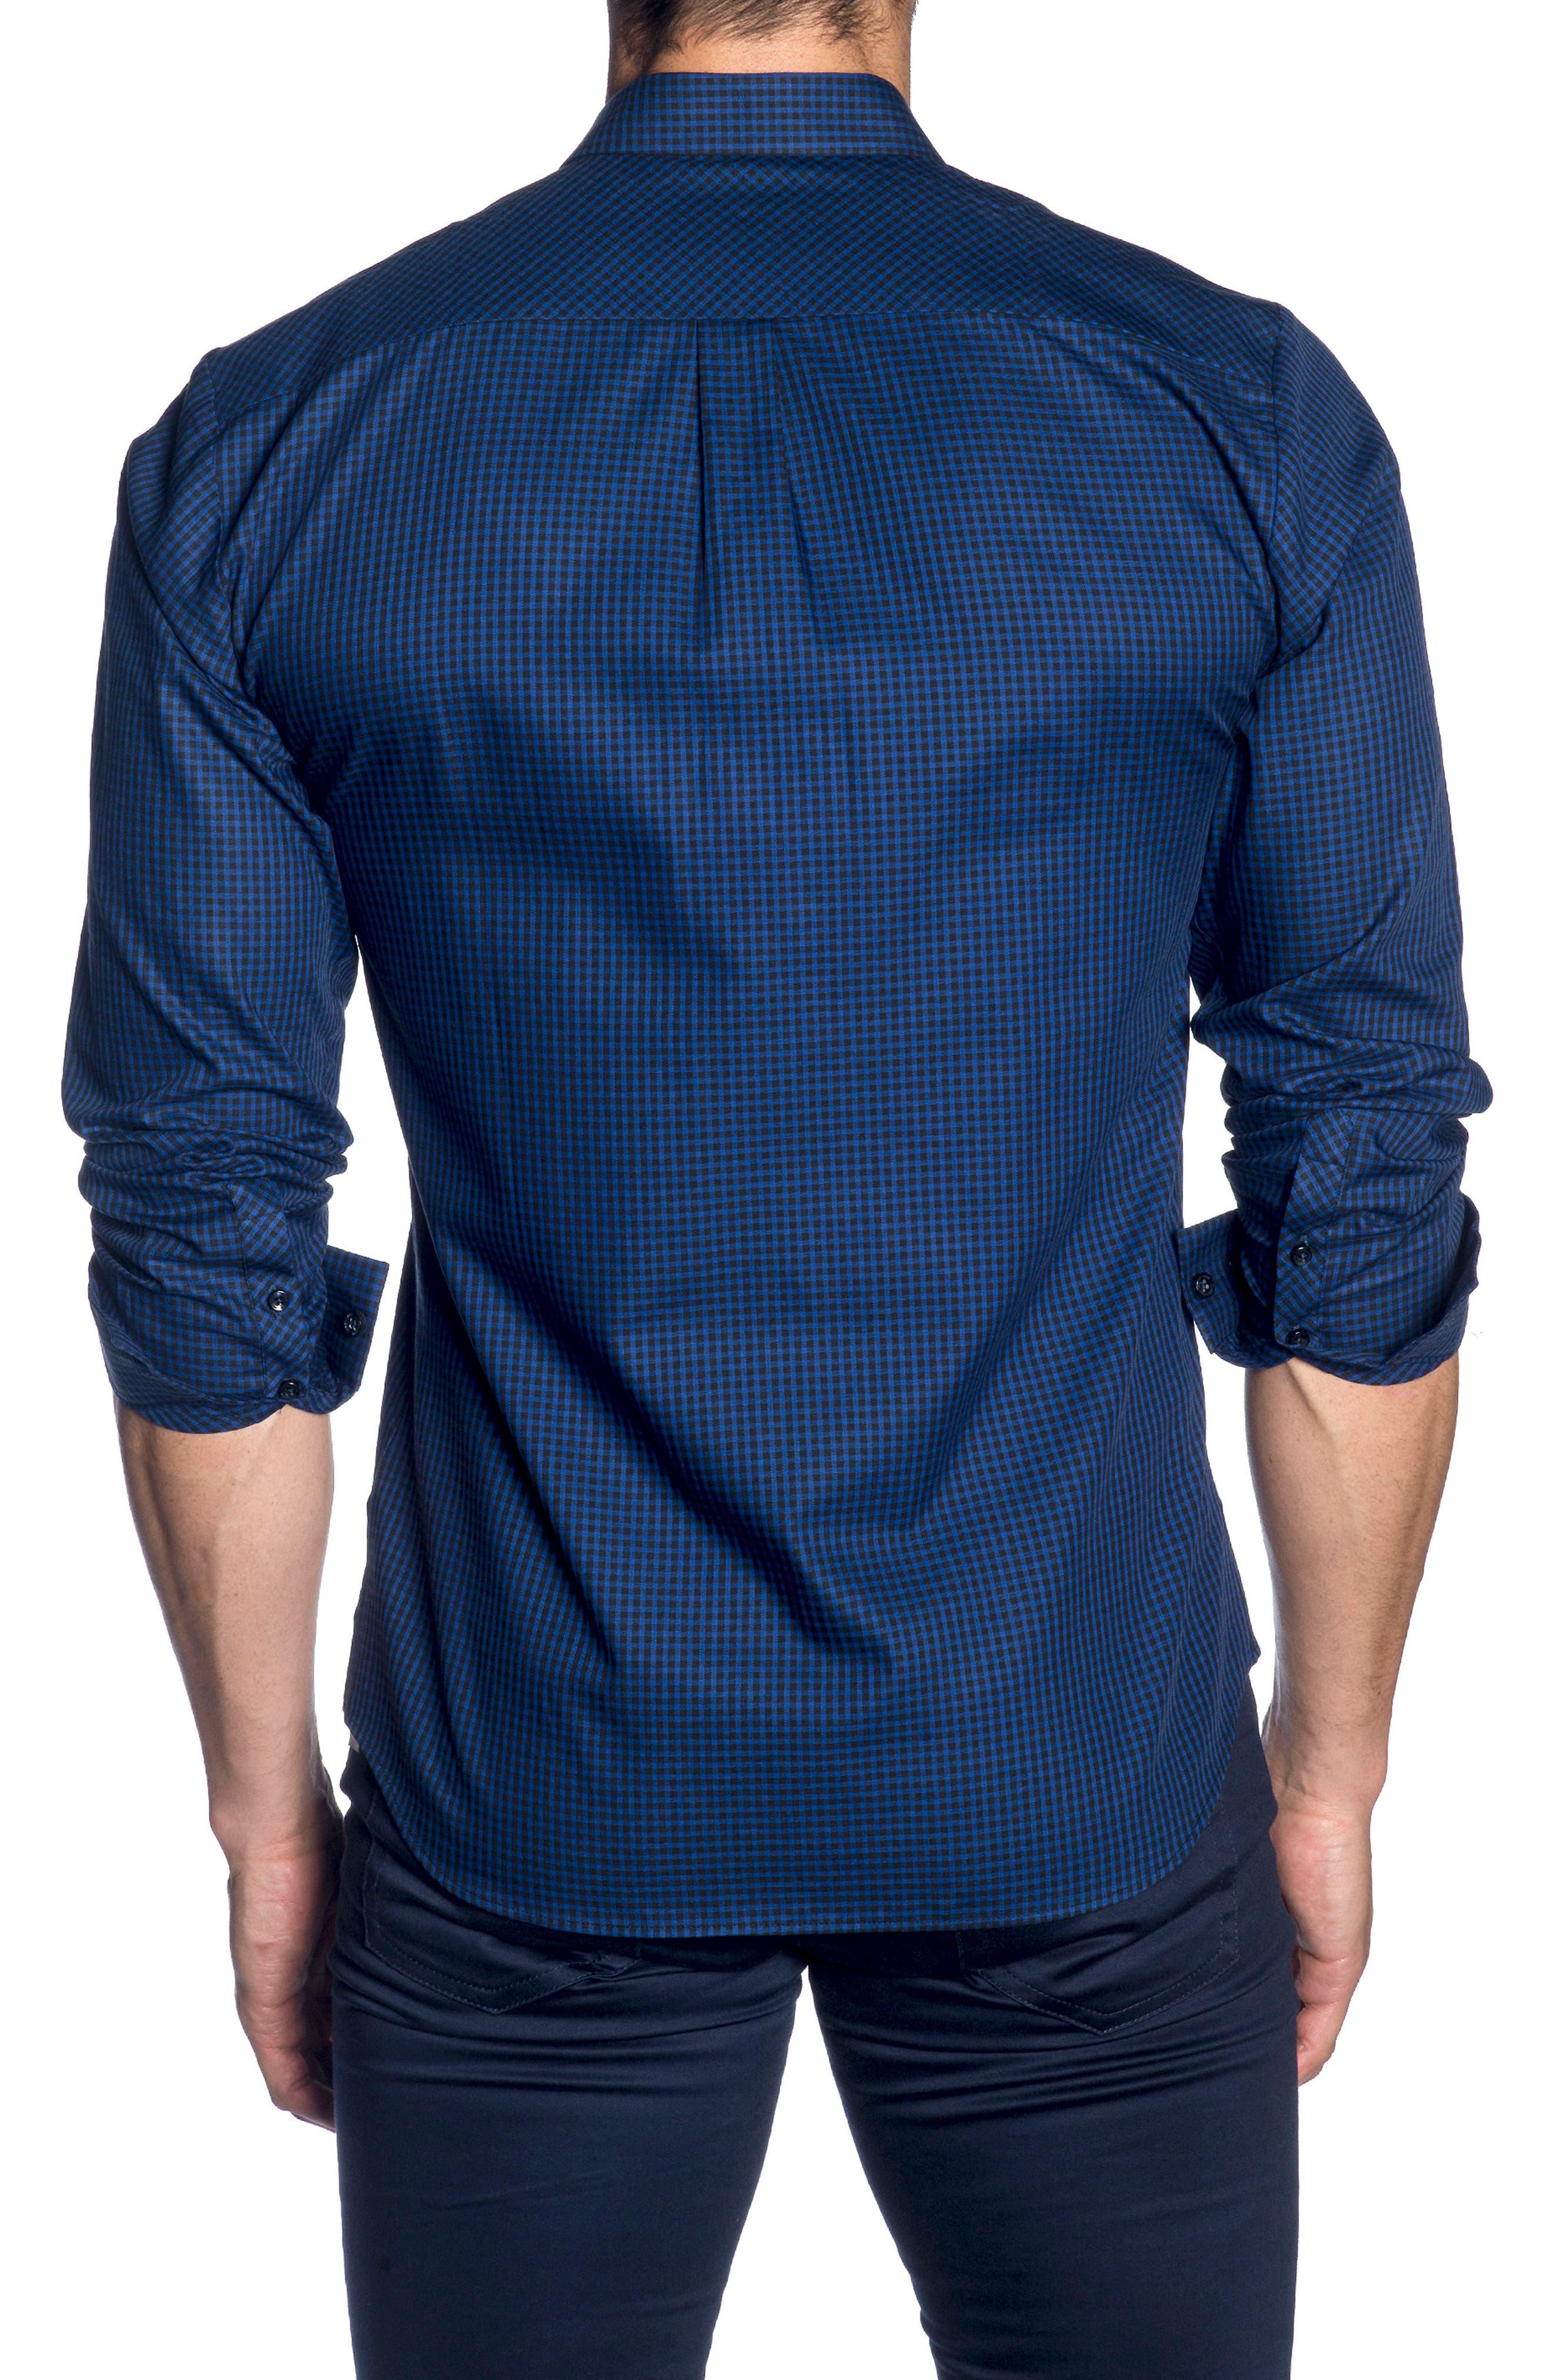 Trim Fit Sport Shirt,                             Alternate thumbnail 2, color,                             BLACK BLUE MICRO CHECK